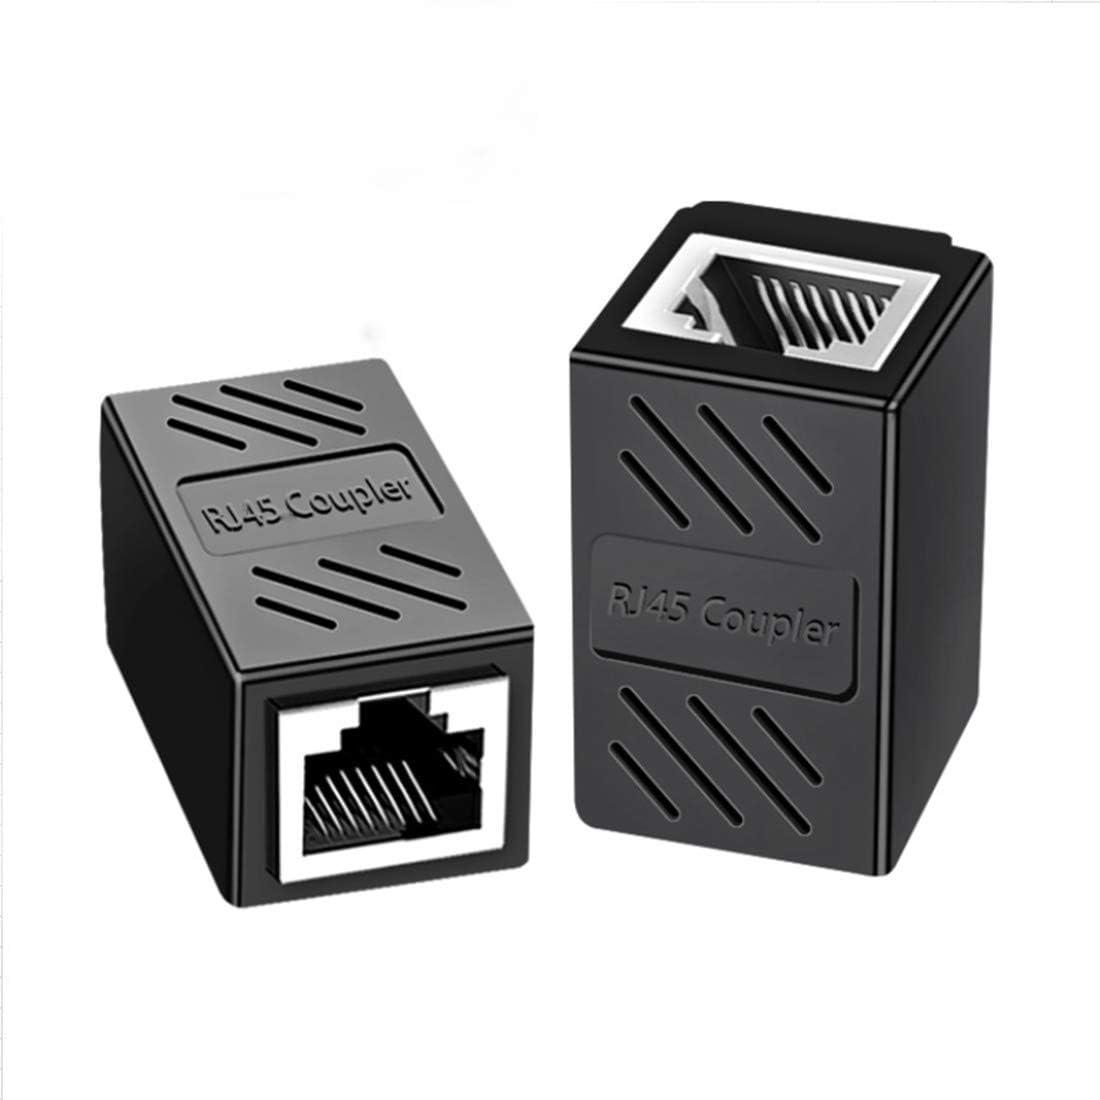 2 piezas Conector RJ45, Acoplador RJ45 para Gigabit Ethernet 1000Mbps Cable de Red Cat 7 Cat 6 Cat 5 (Negro)